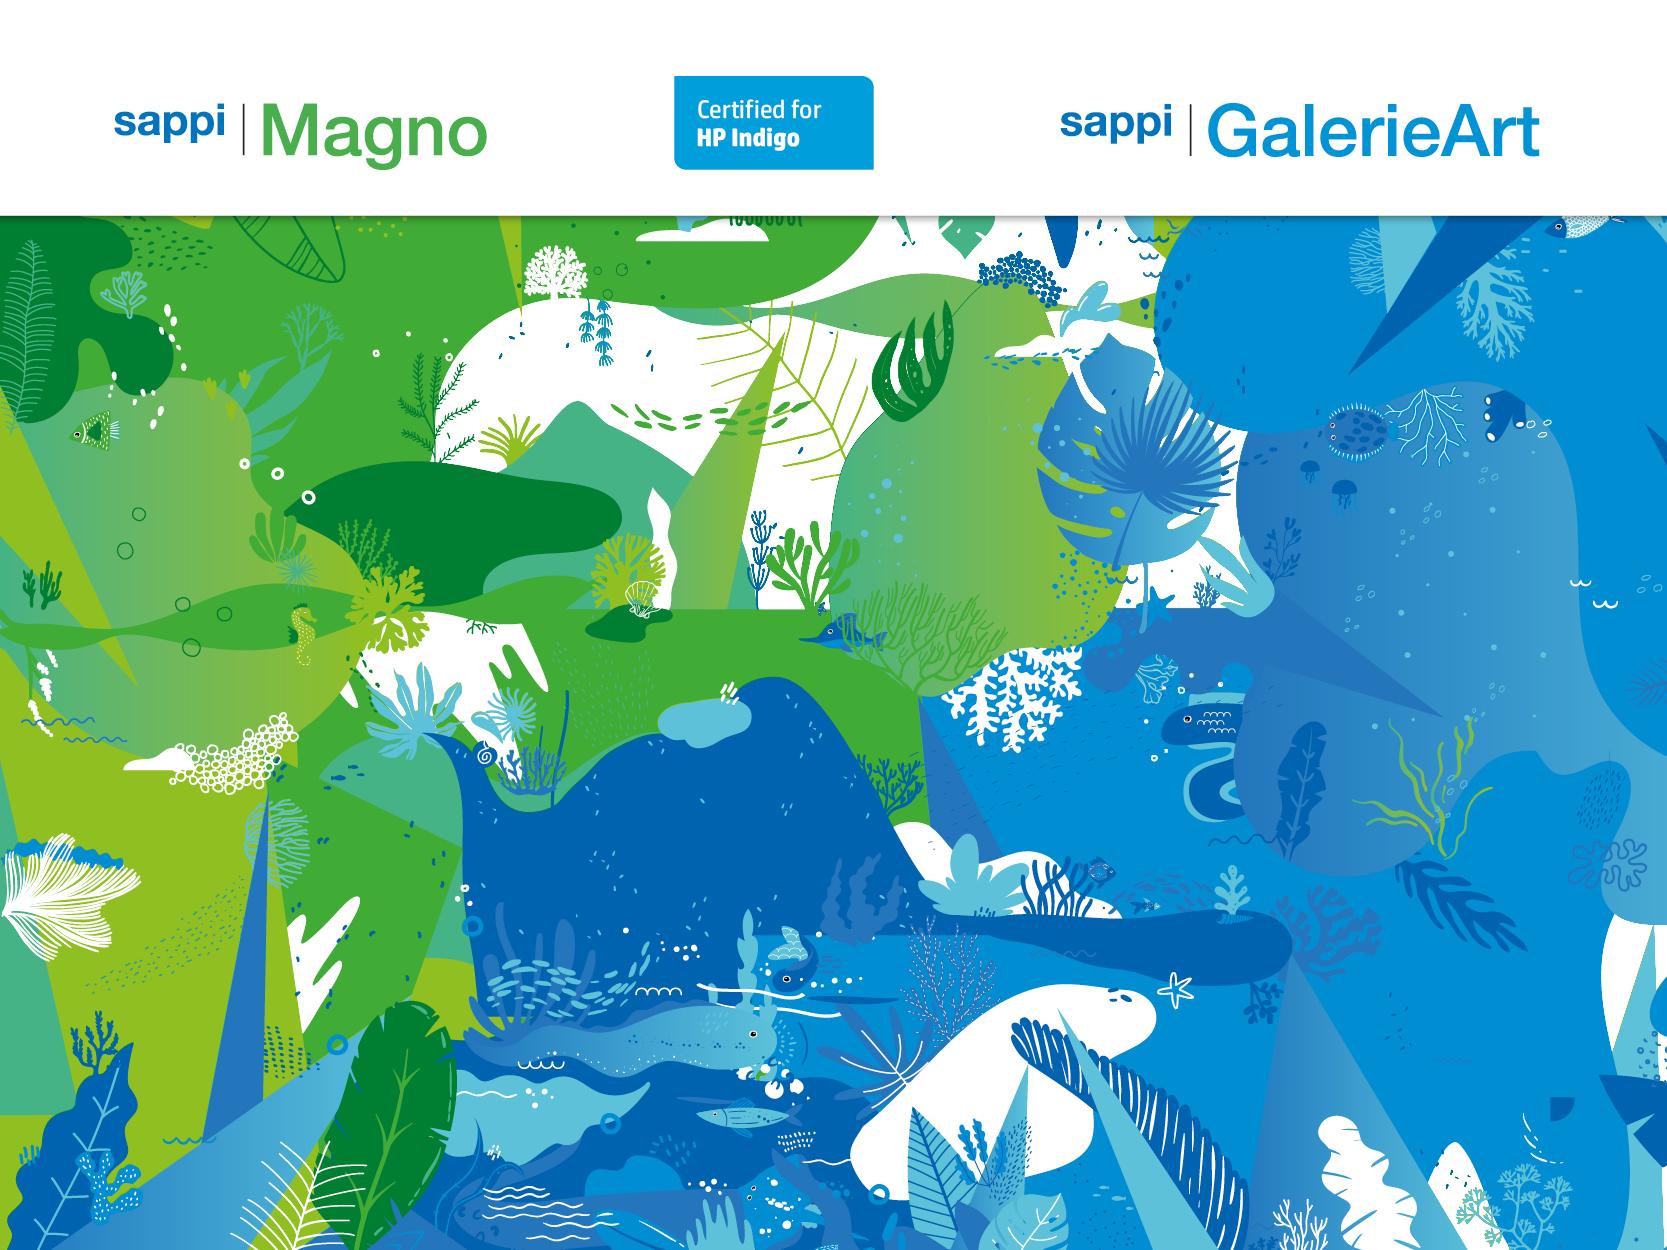 HP_Magno_GalerieArt_social_media